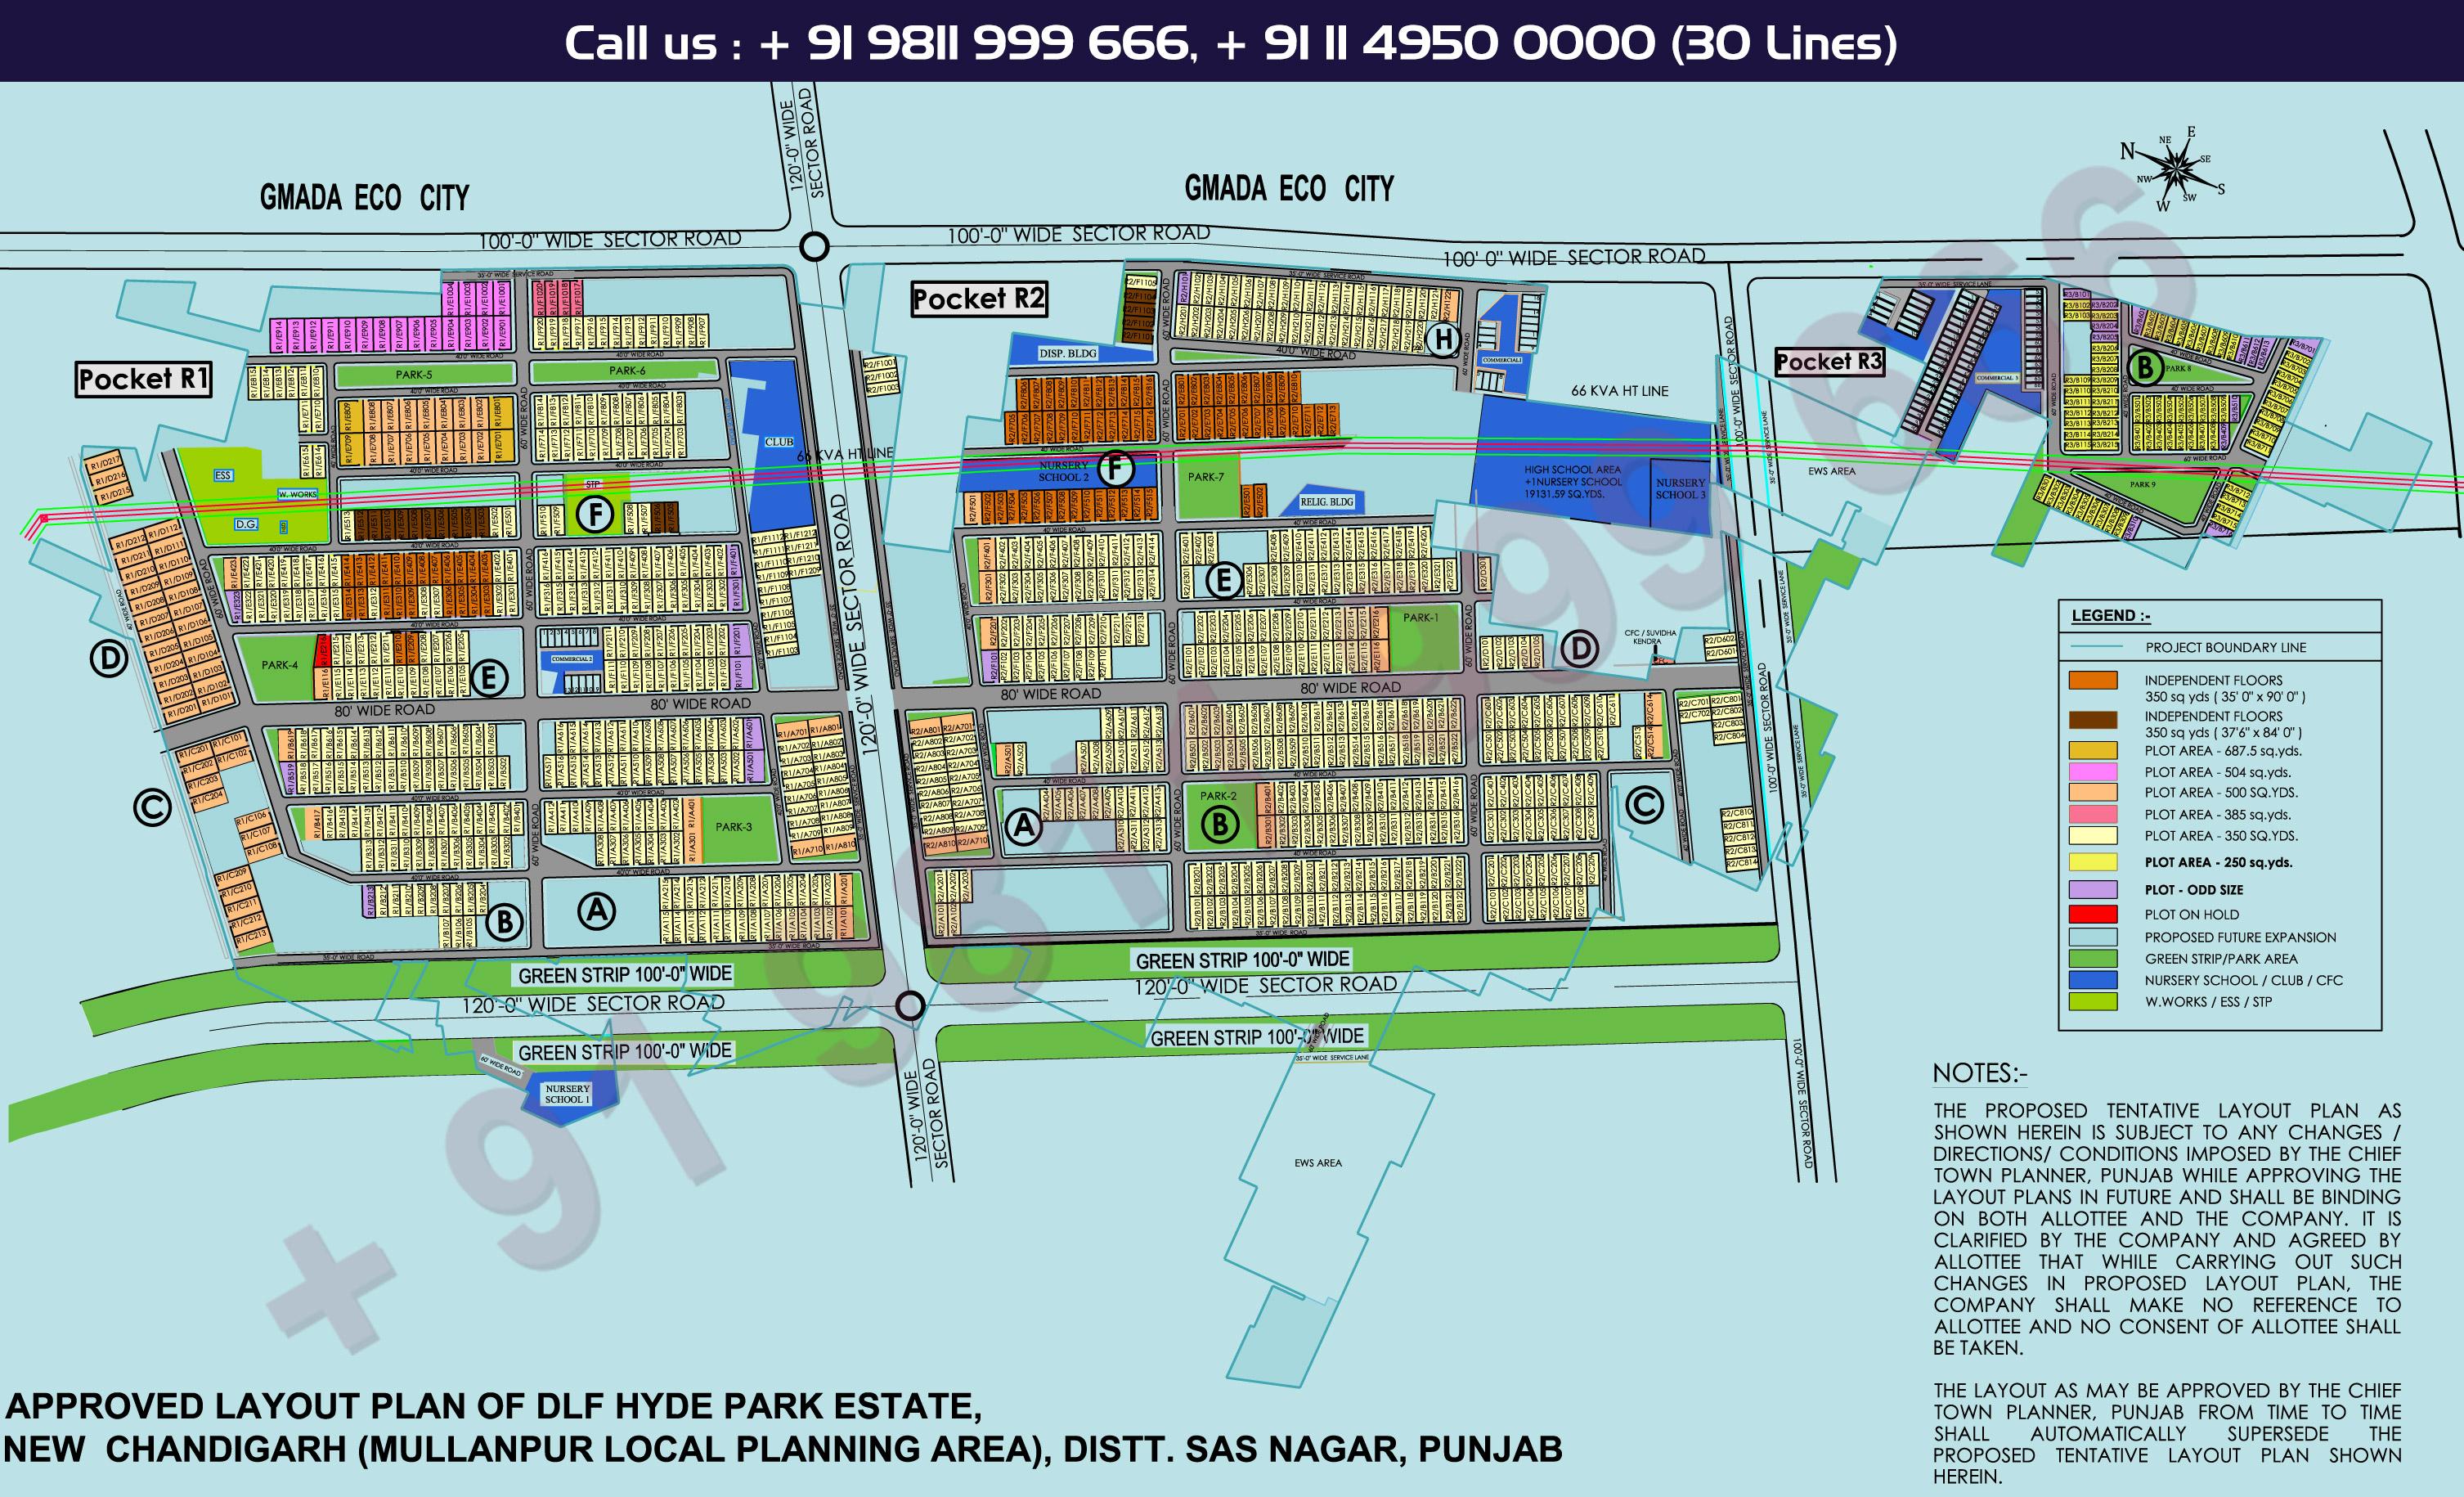 DLF Hyde Park Site Plan